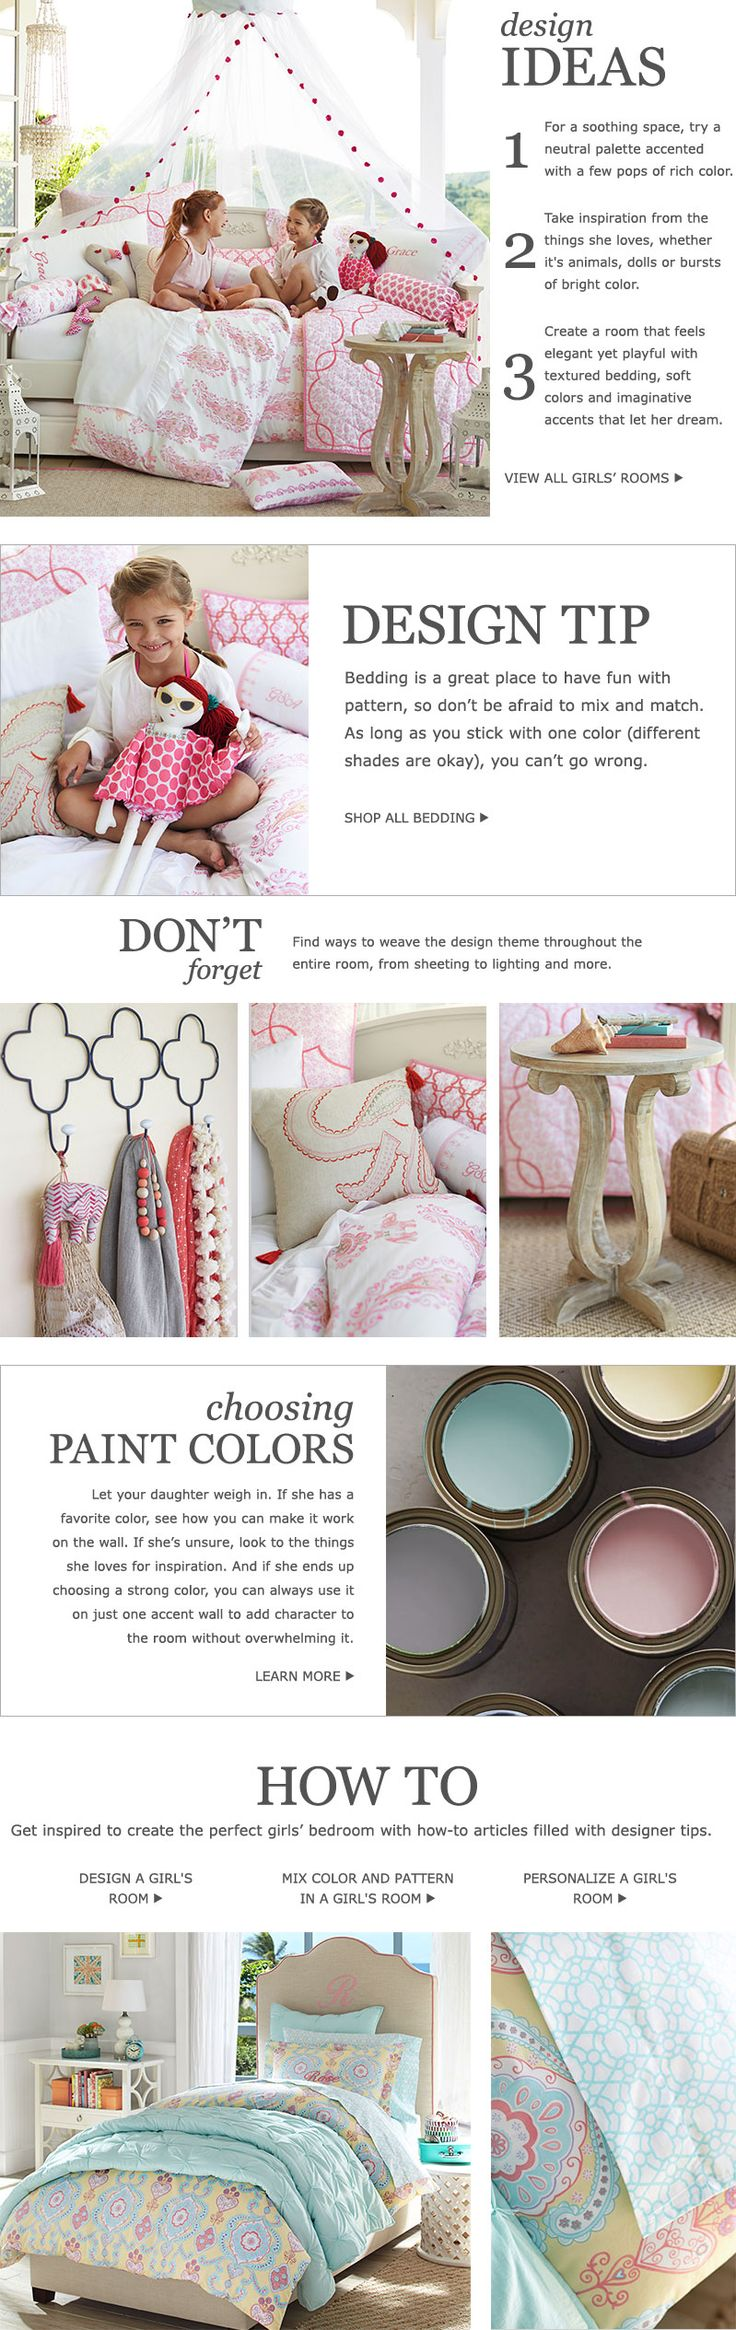 Girls Bedroom Ideas  amp  Girls Room Ideas   Pottery Barn Kids